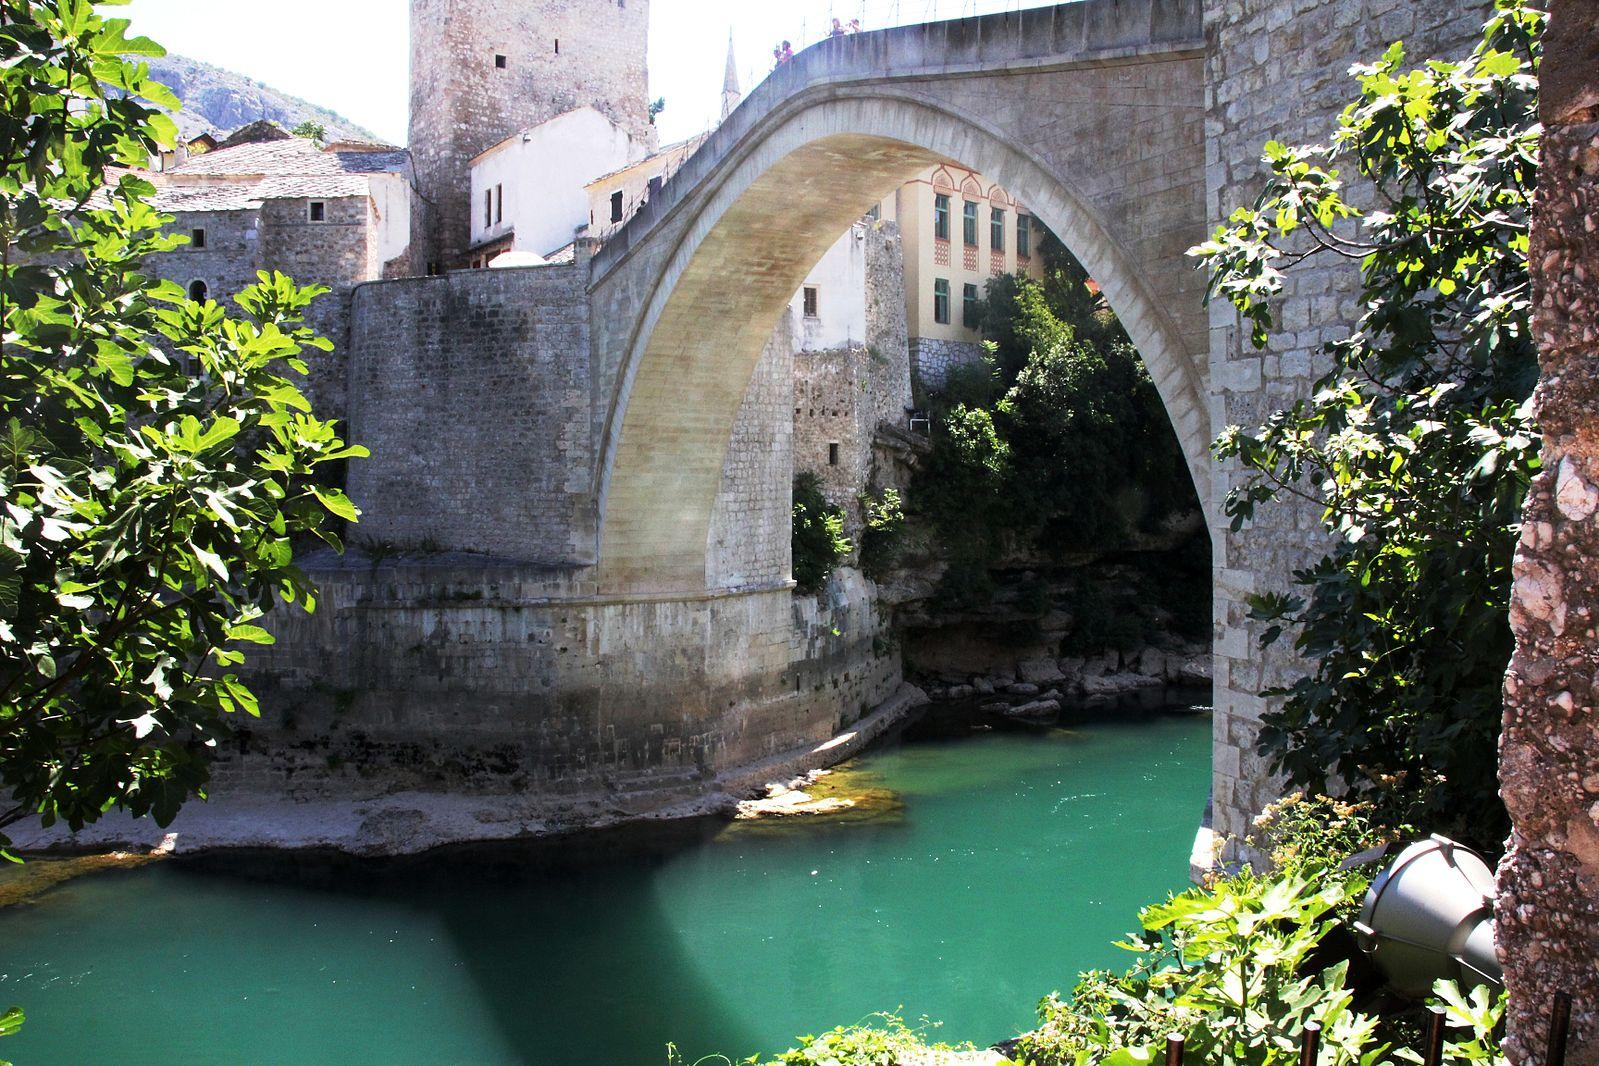 1599px-Bridge_Mostar